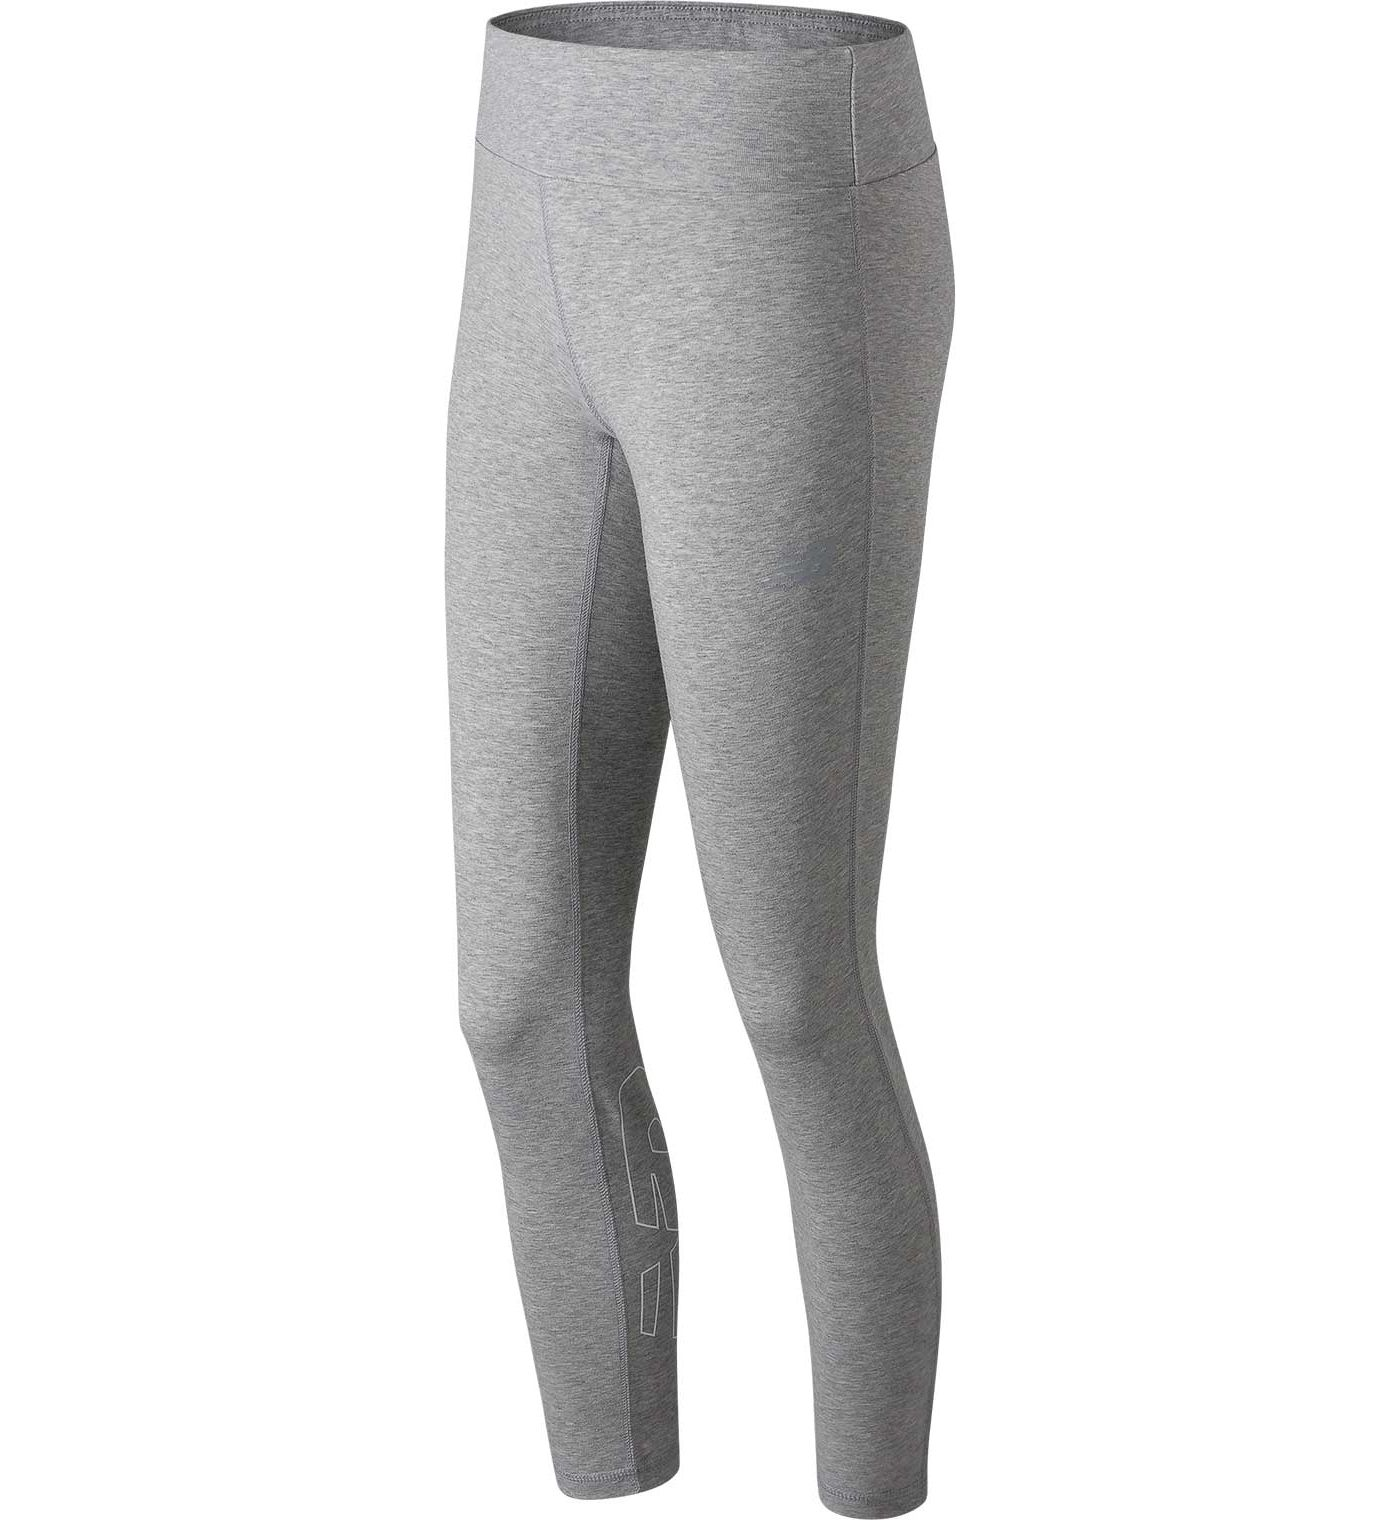 New Balance Women's Athletics Legging